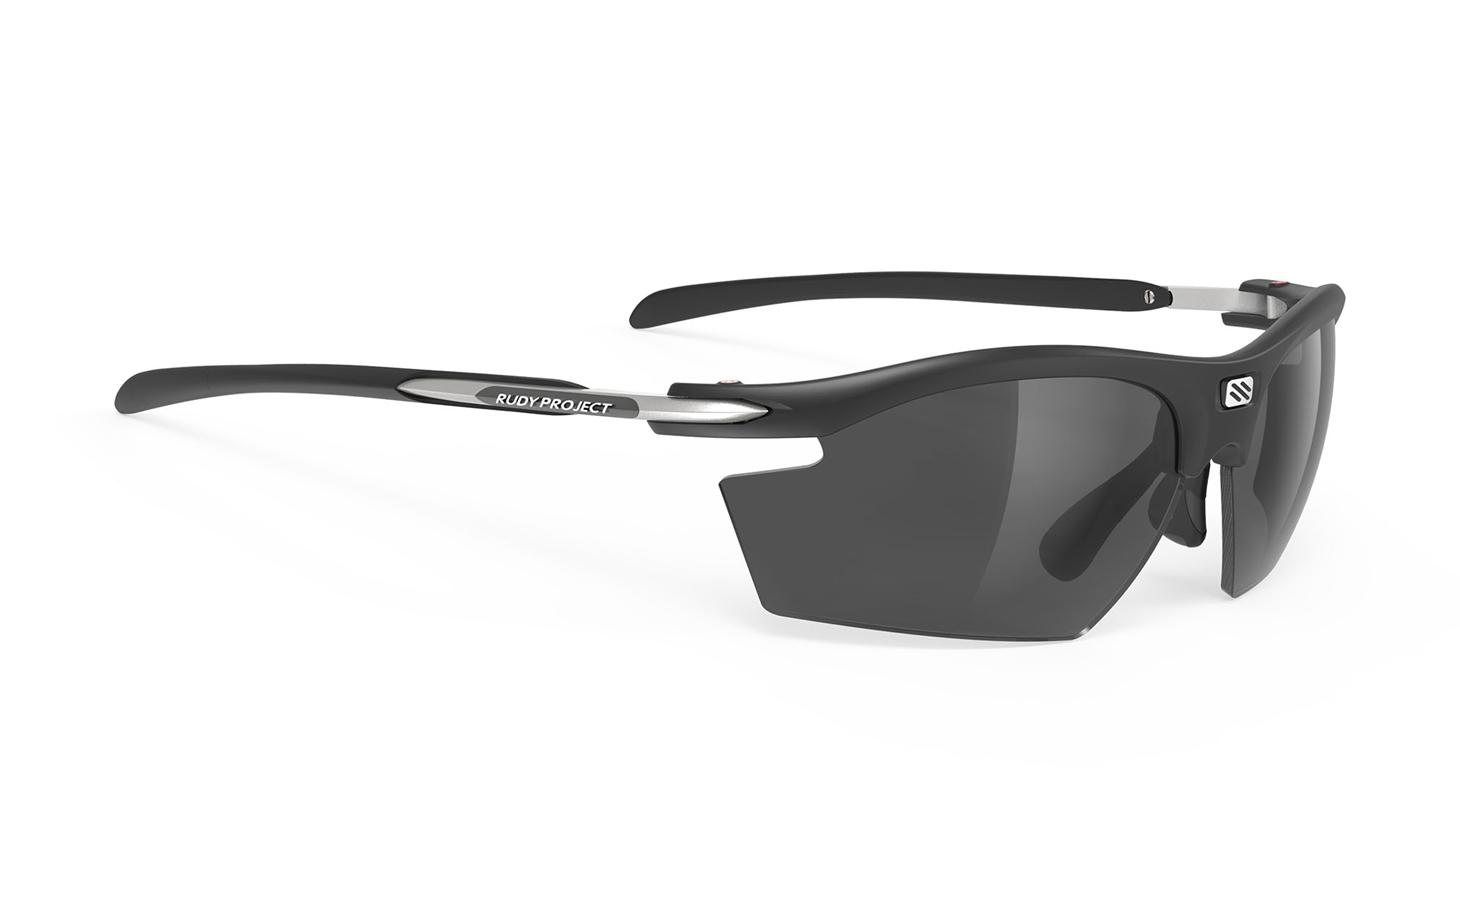 b815351c98 Performance Eyewear Rydon - Rudy Project